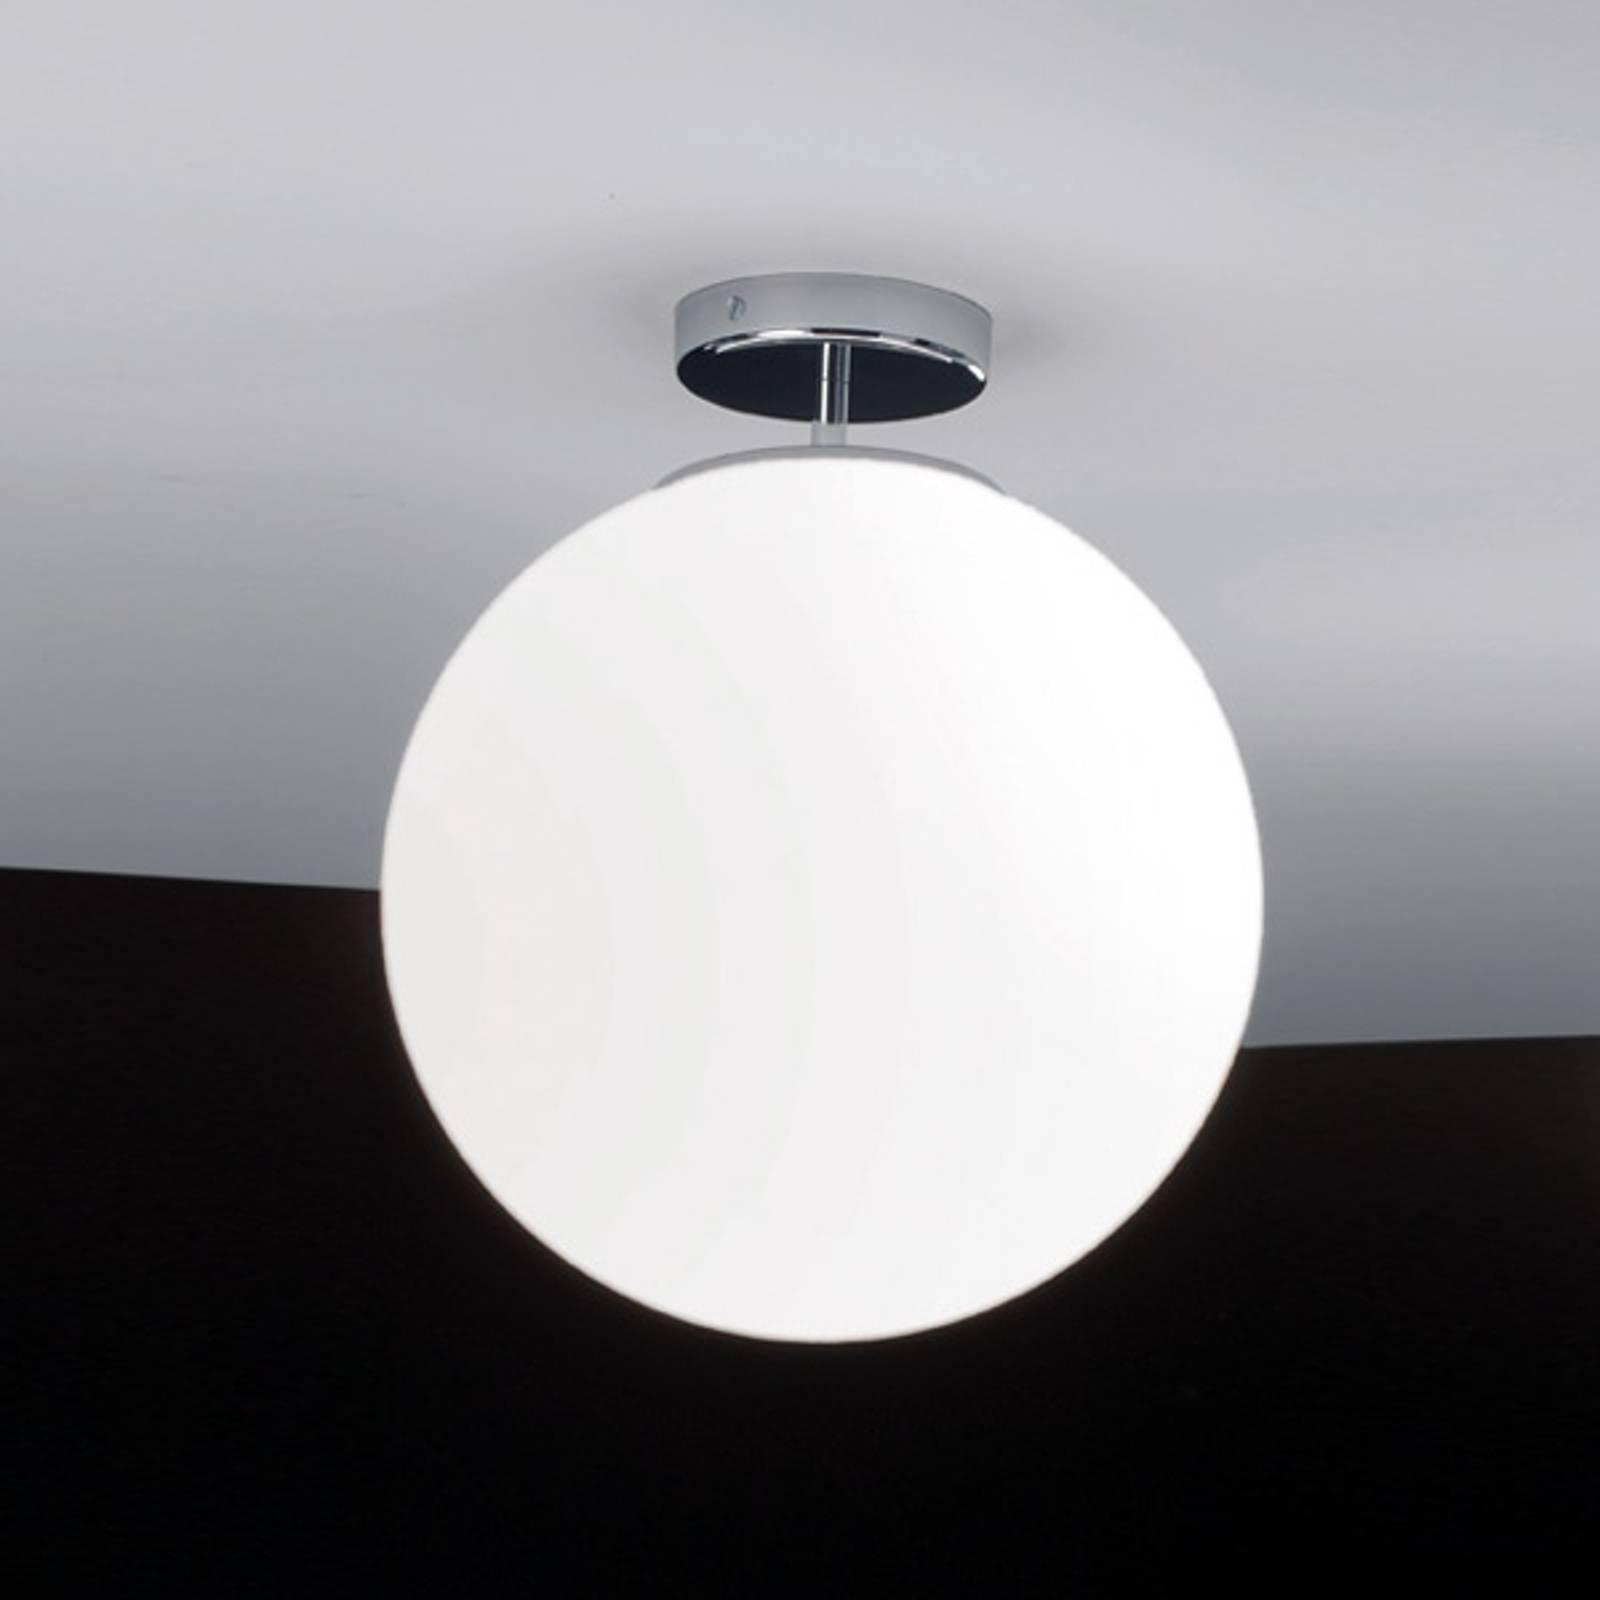 Glazen plafondlamp Sferis, 30 cm, chroom